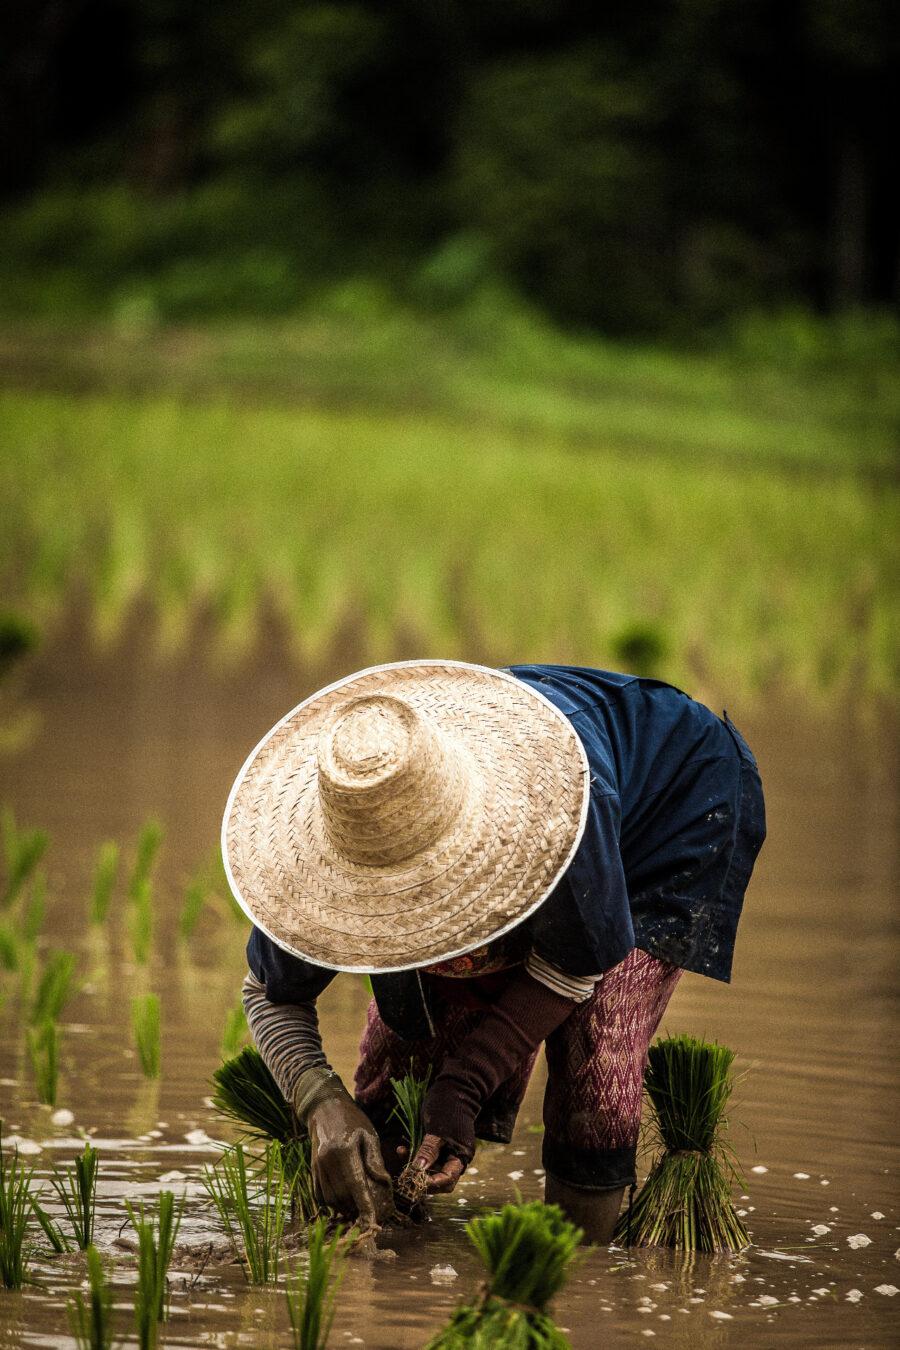 Rice Field Work in Chiang Mai, Thailand by Eduardo Prim